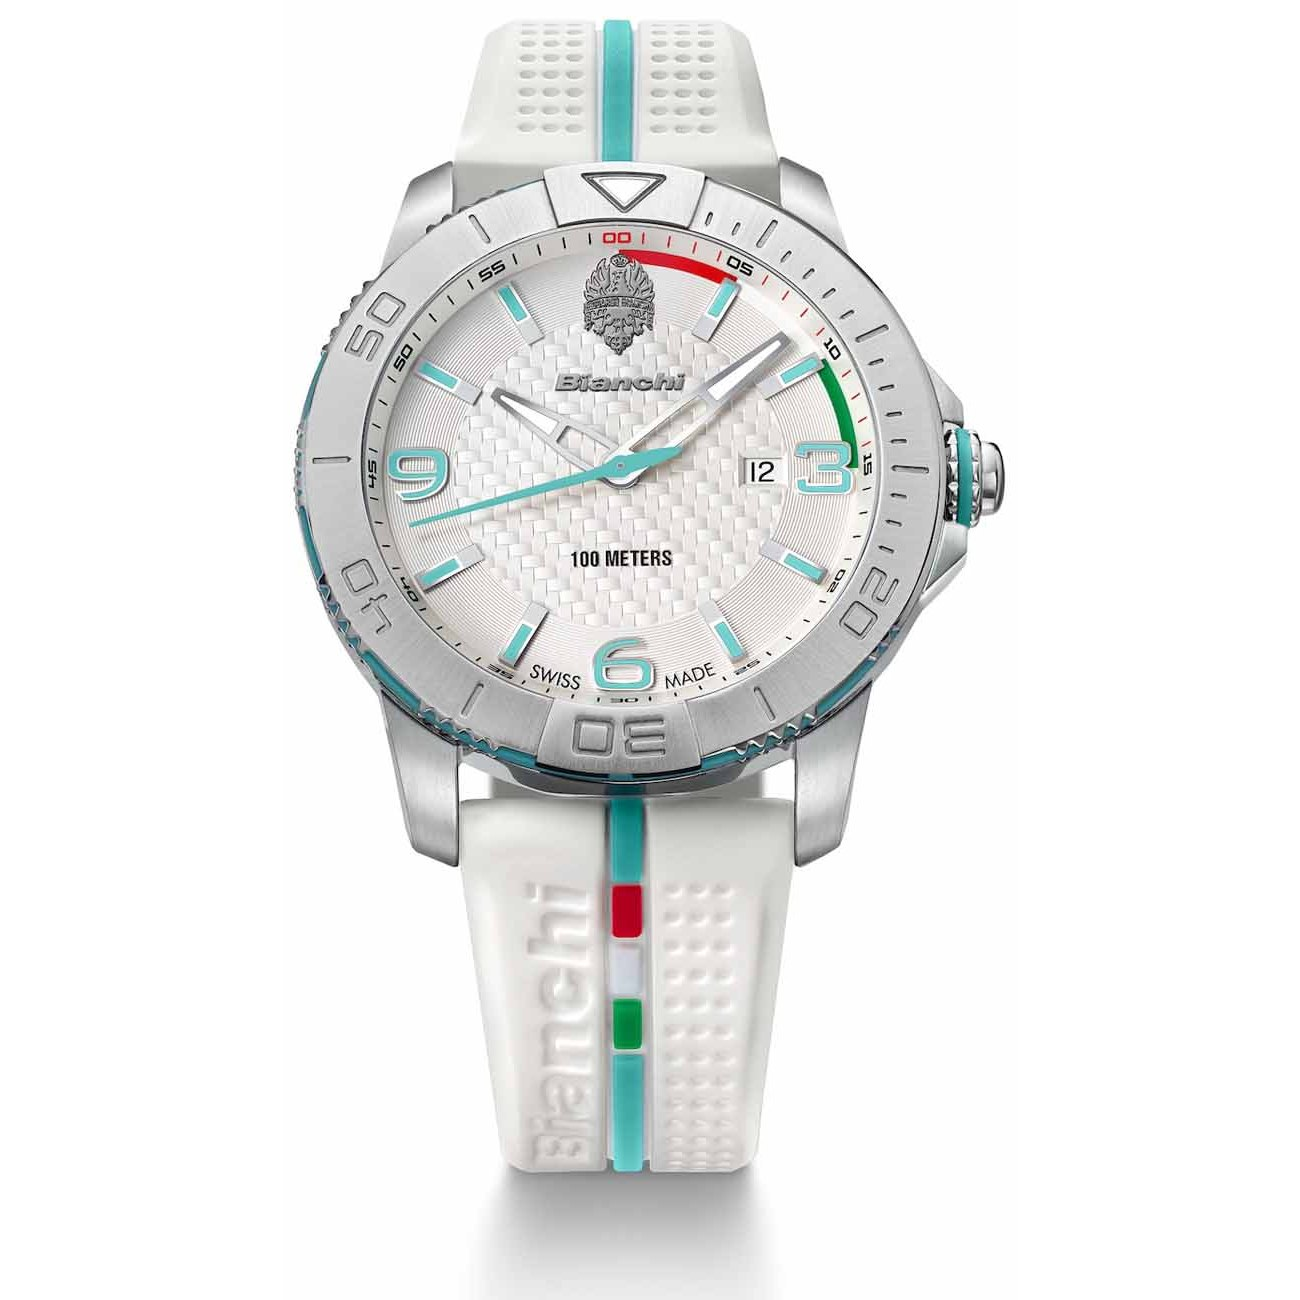 Image of Bianchi Three Hands Wrist Watch - White